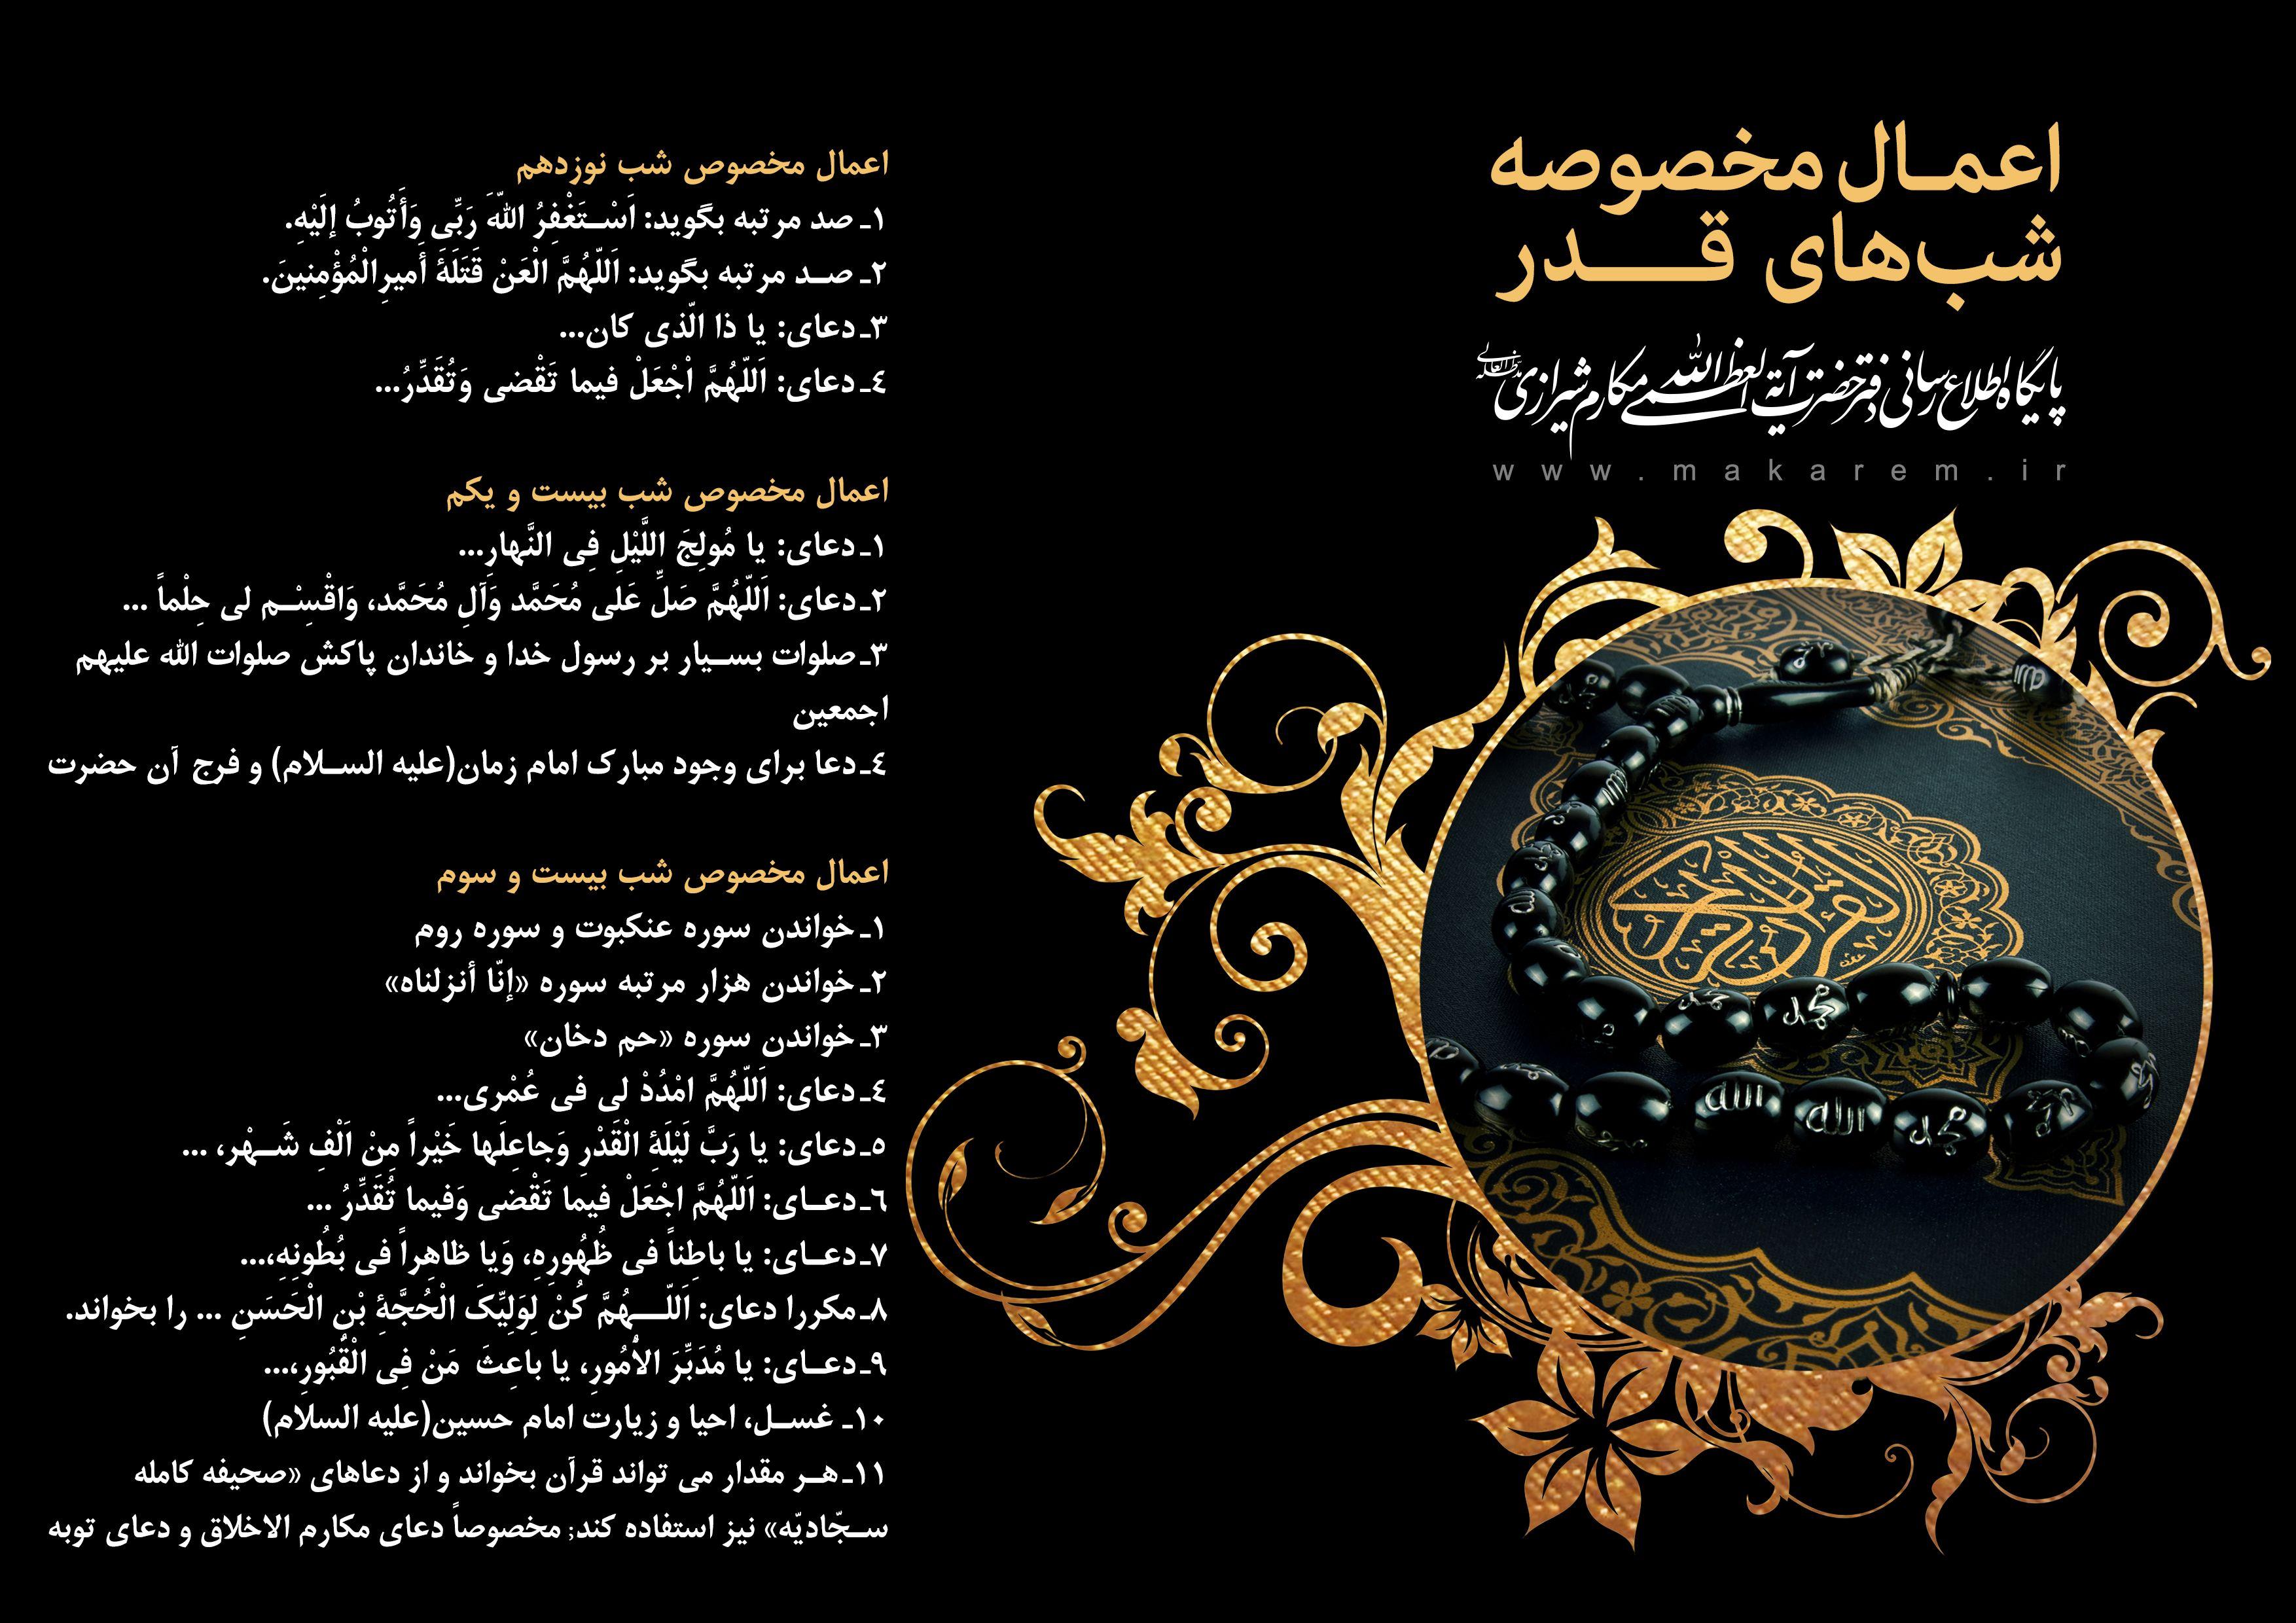 شب قدر-مدرسه الامام امیر المومنین (ع)